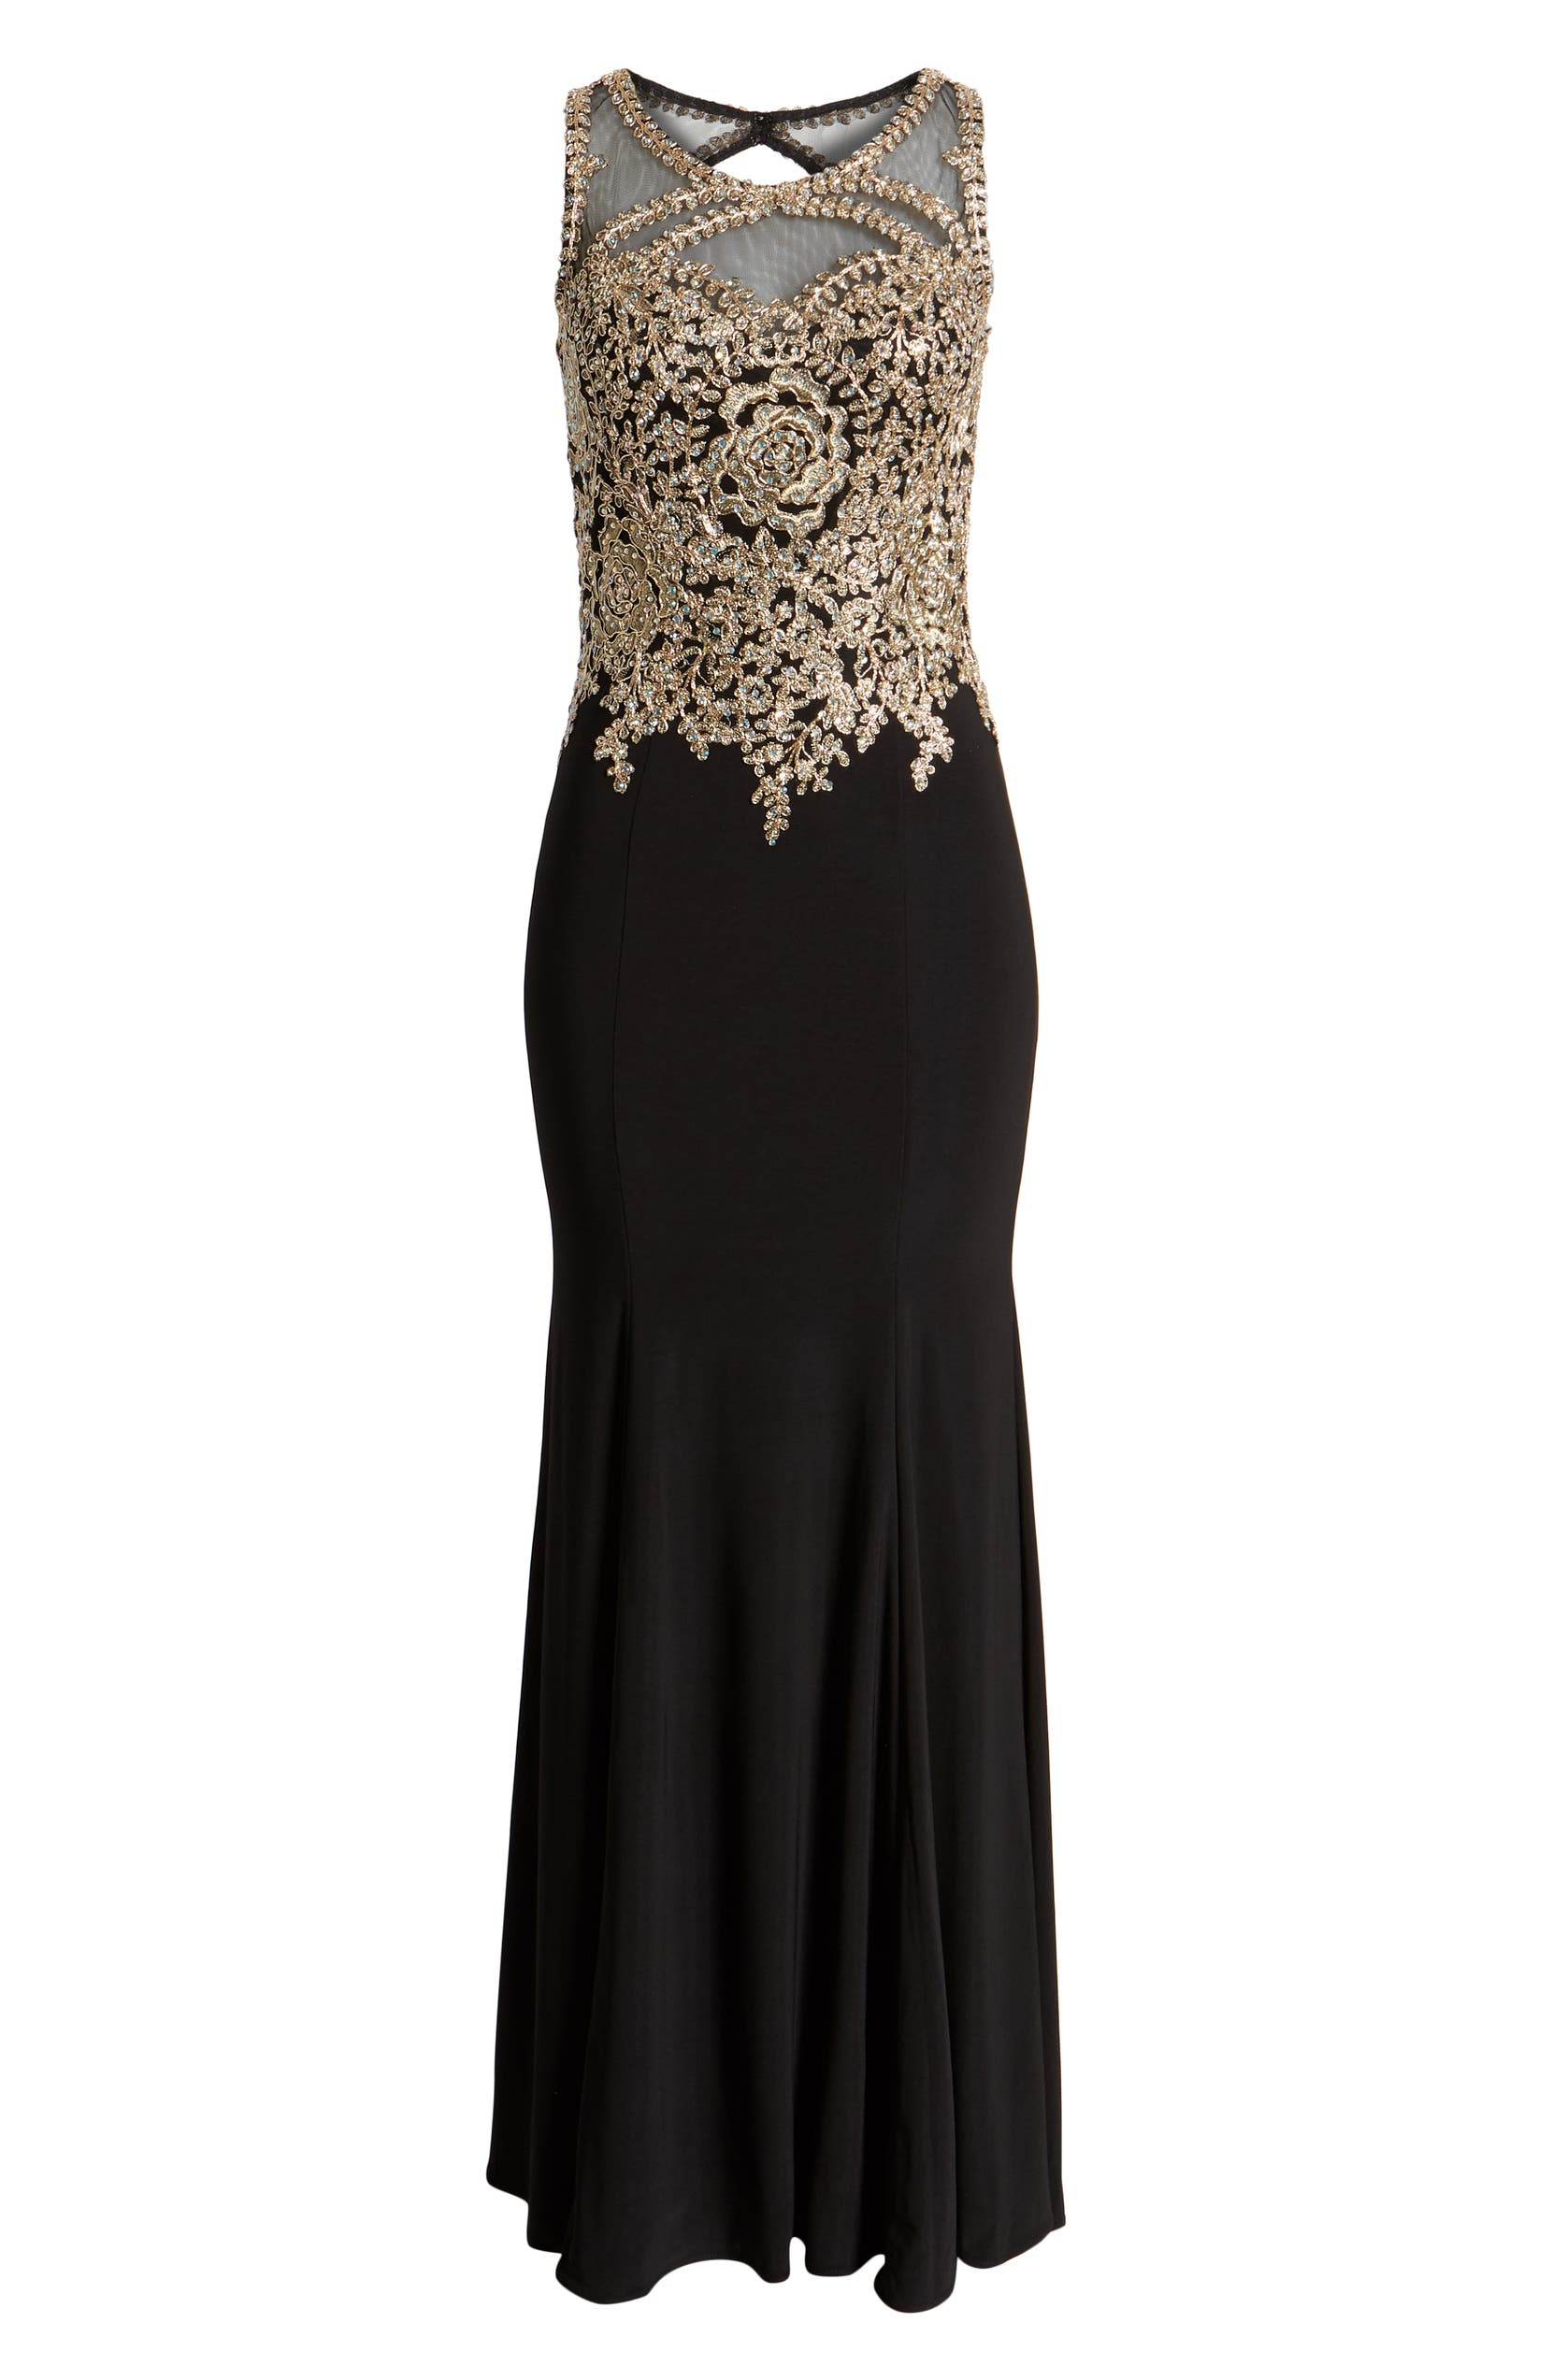 368afe33987 Xscape Golden Embroidered Bodice Evening Dress (Regular & Plus Size) |  Nordstrom